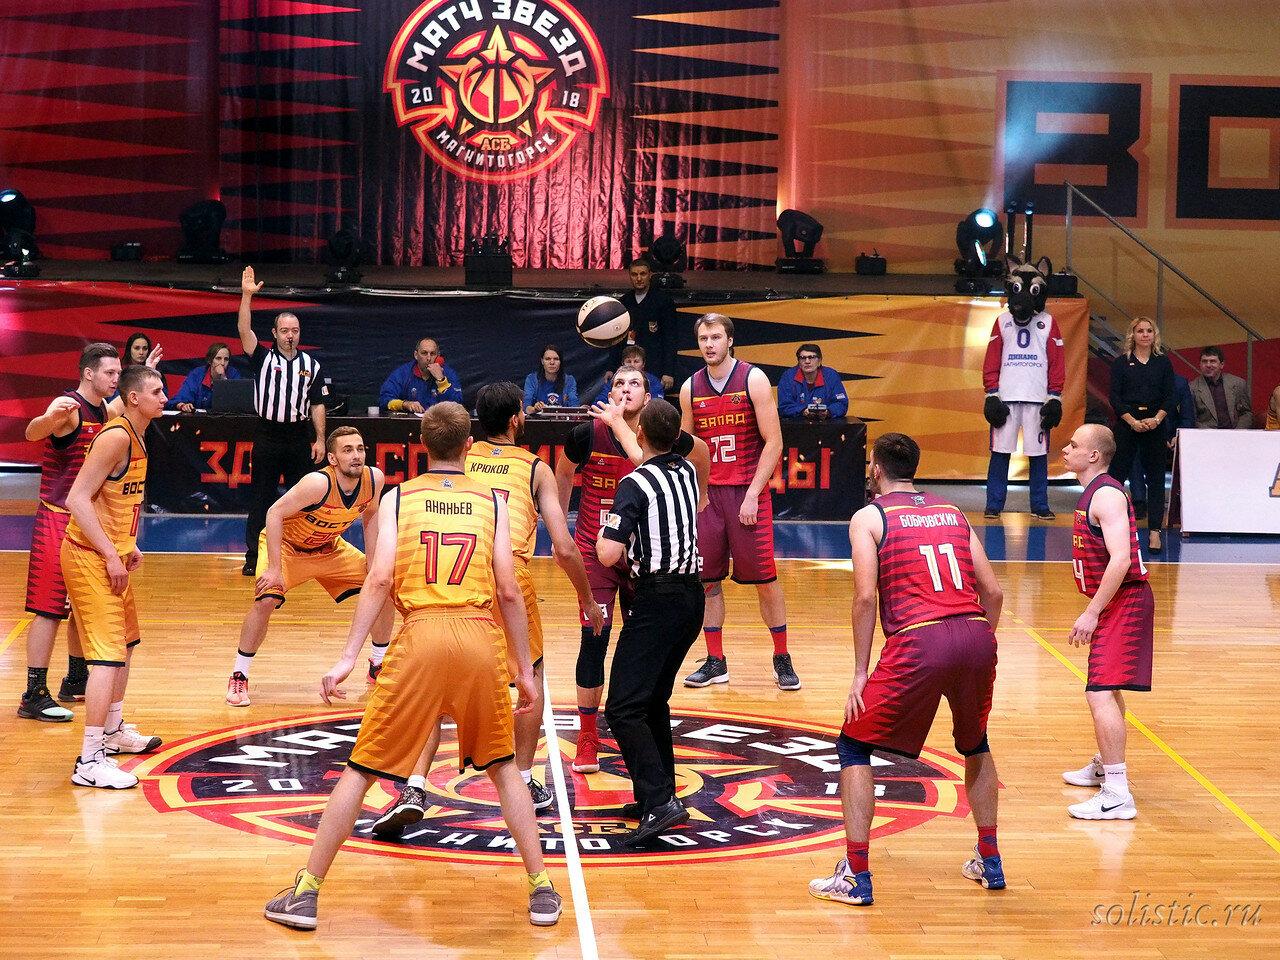 56 Матч звезд АСБ 2018 (ассоциации студенческого баскетбола)